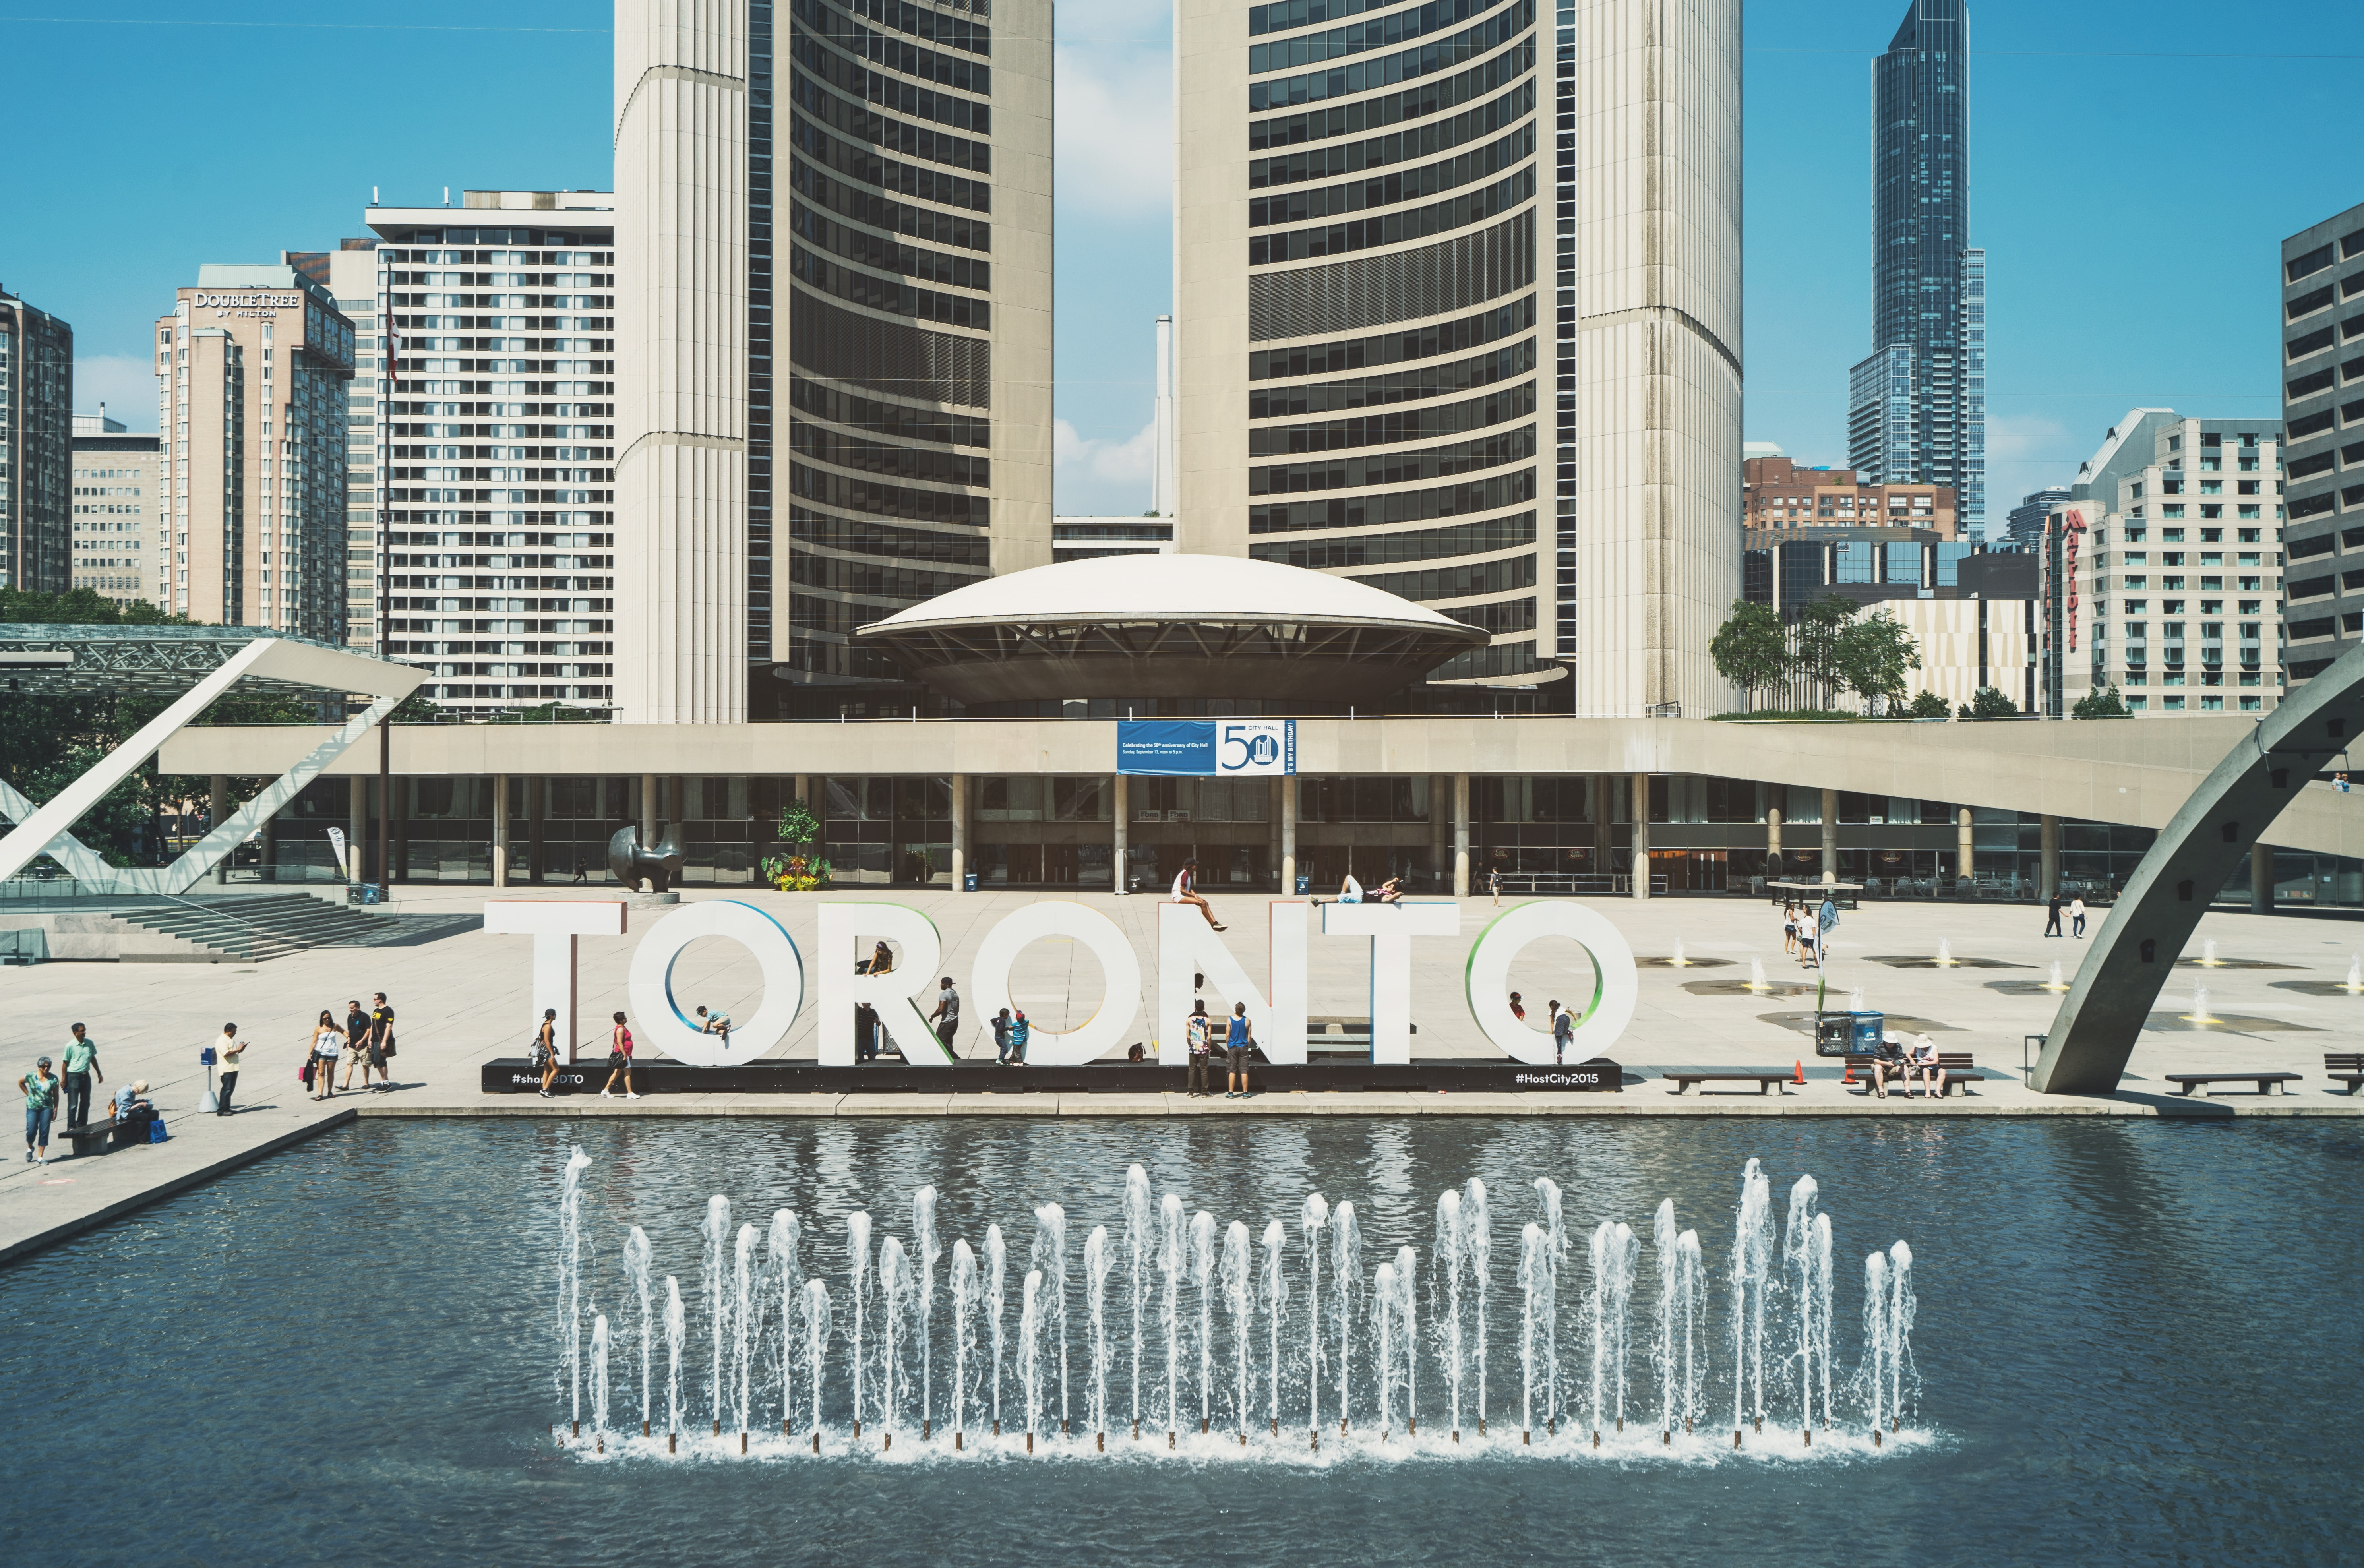 Toronto building near fountain